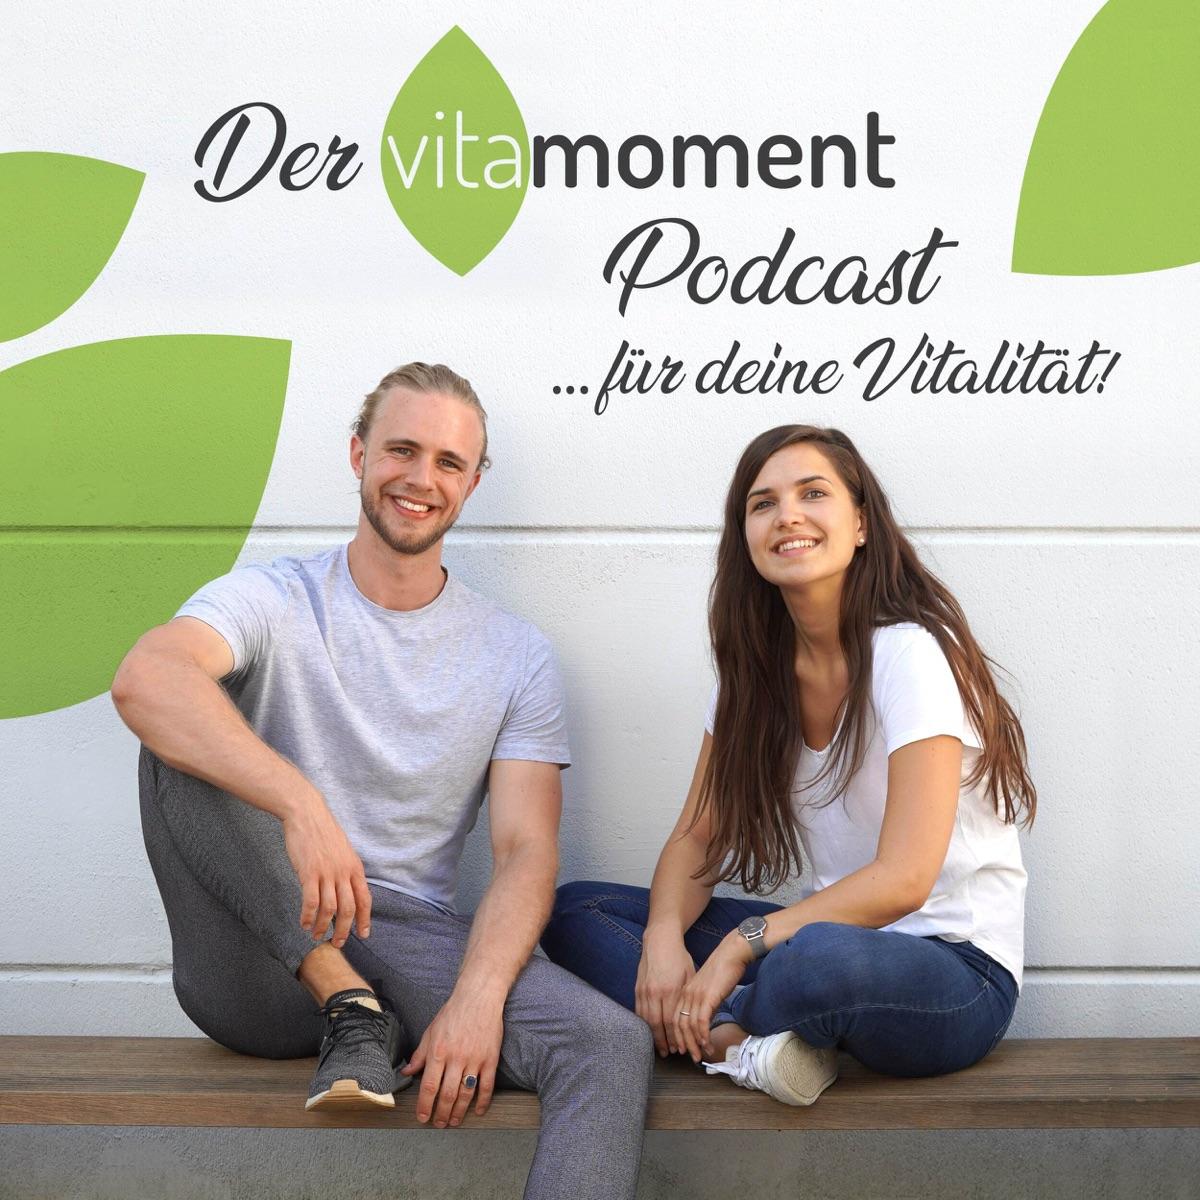 VitaMoment Podcast